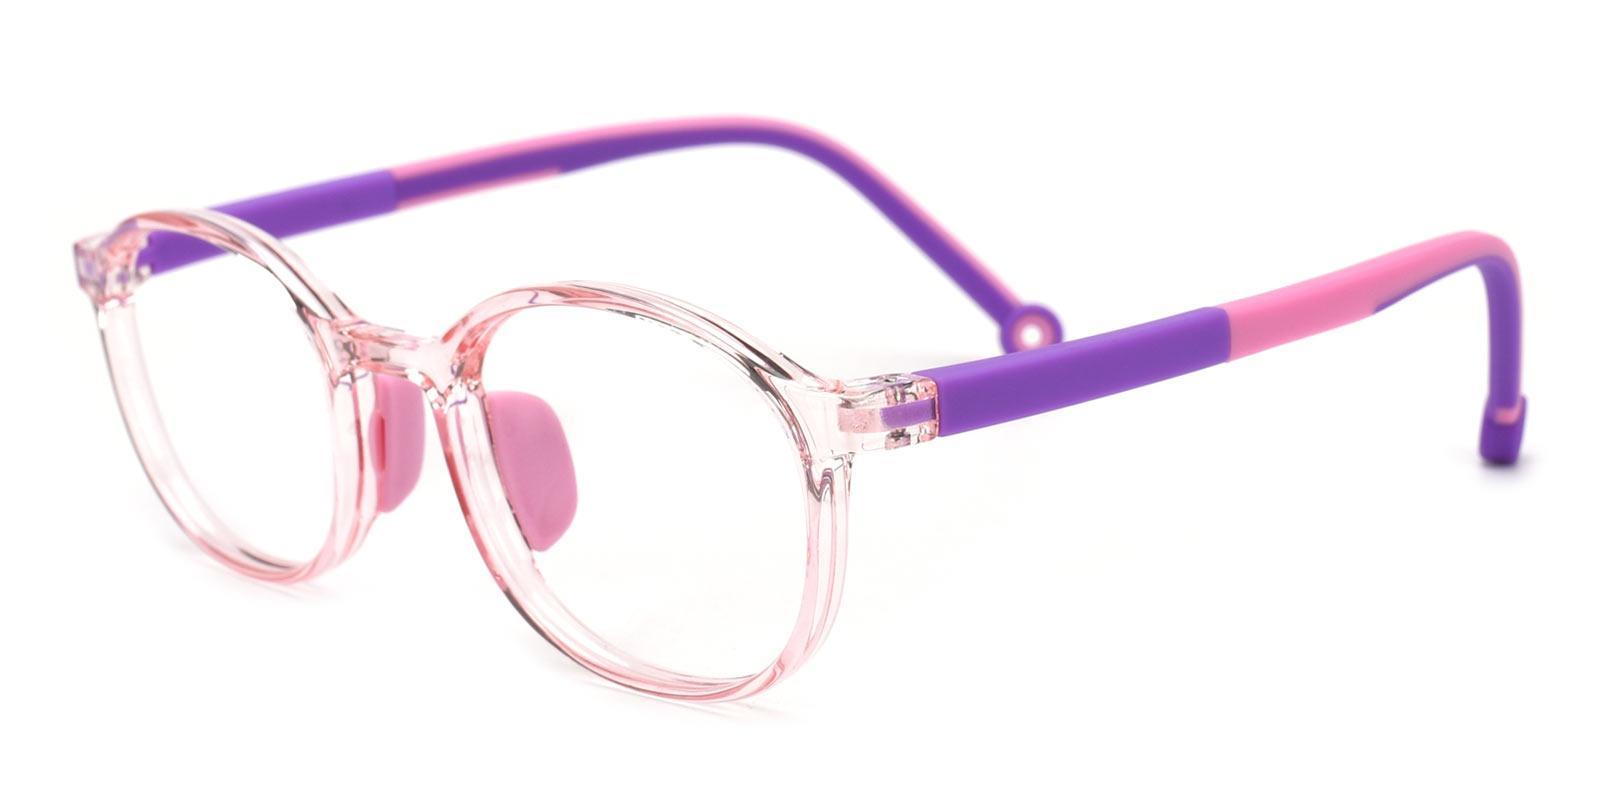 Glen-Pink-Oval-Plastic-Eyeglasses-detail